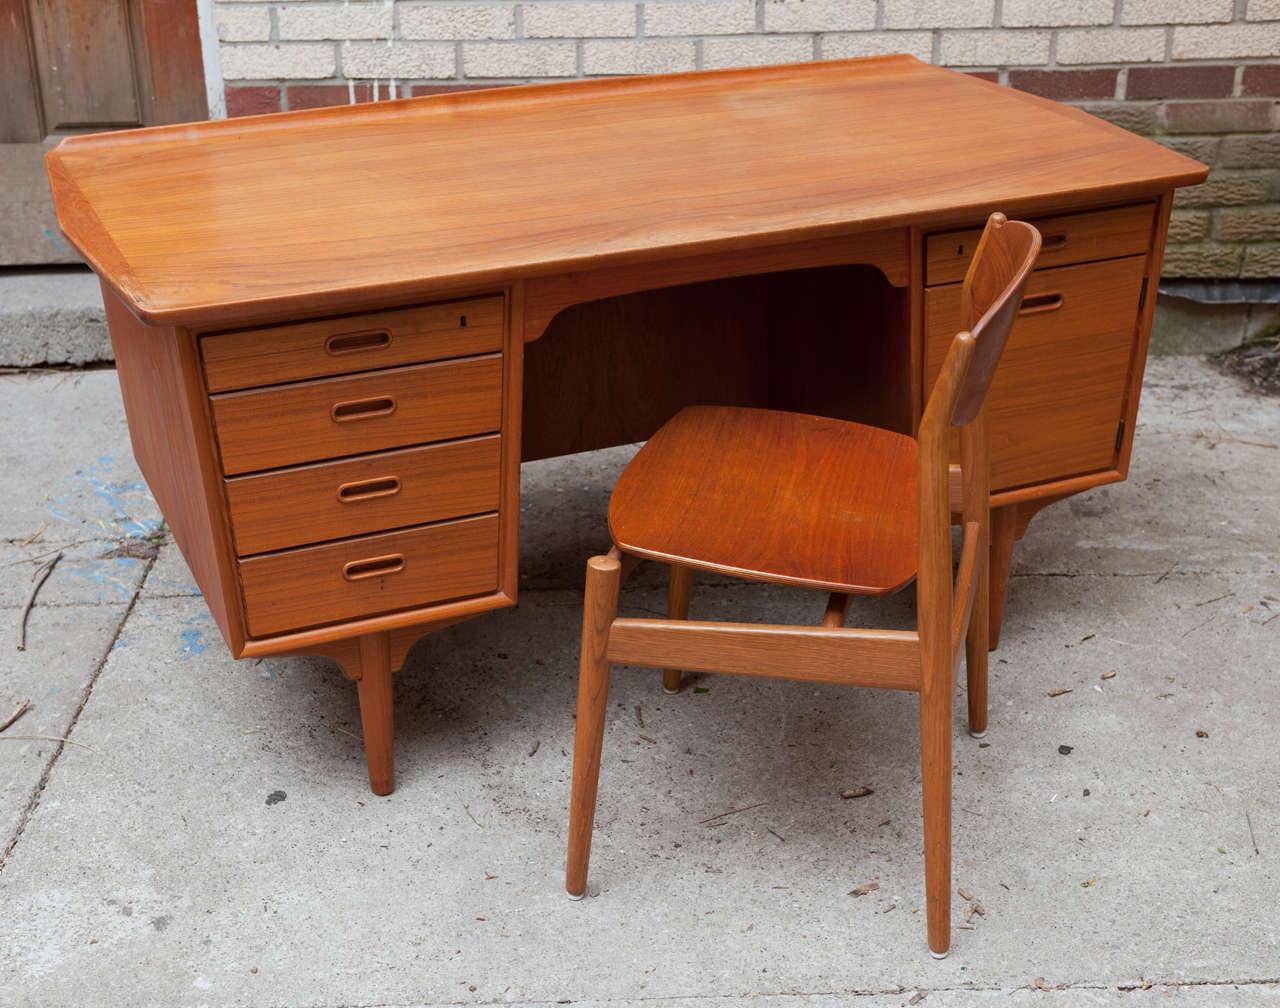 Mid Century Sculptural Teak Desk And Chair Designed By Svend U0026 Madsen For  Sigurd Hensen.